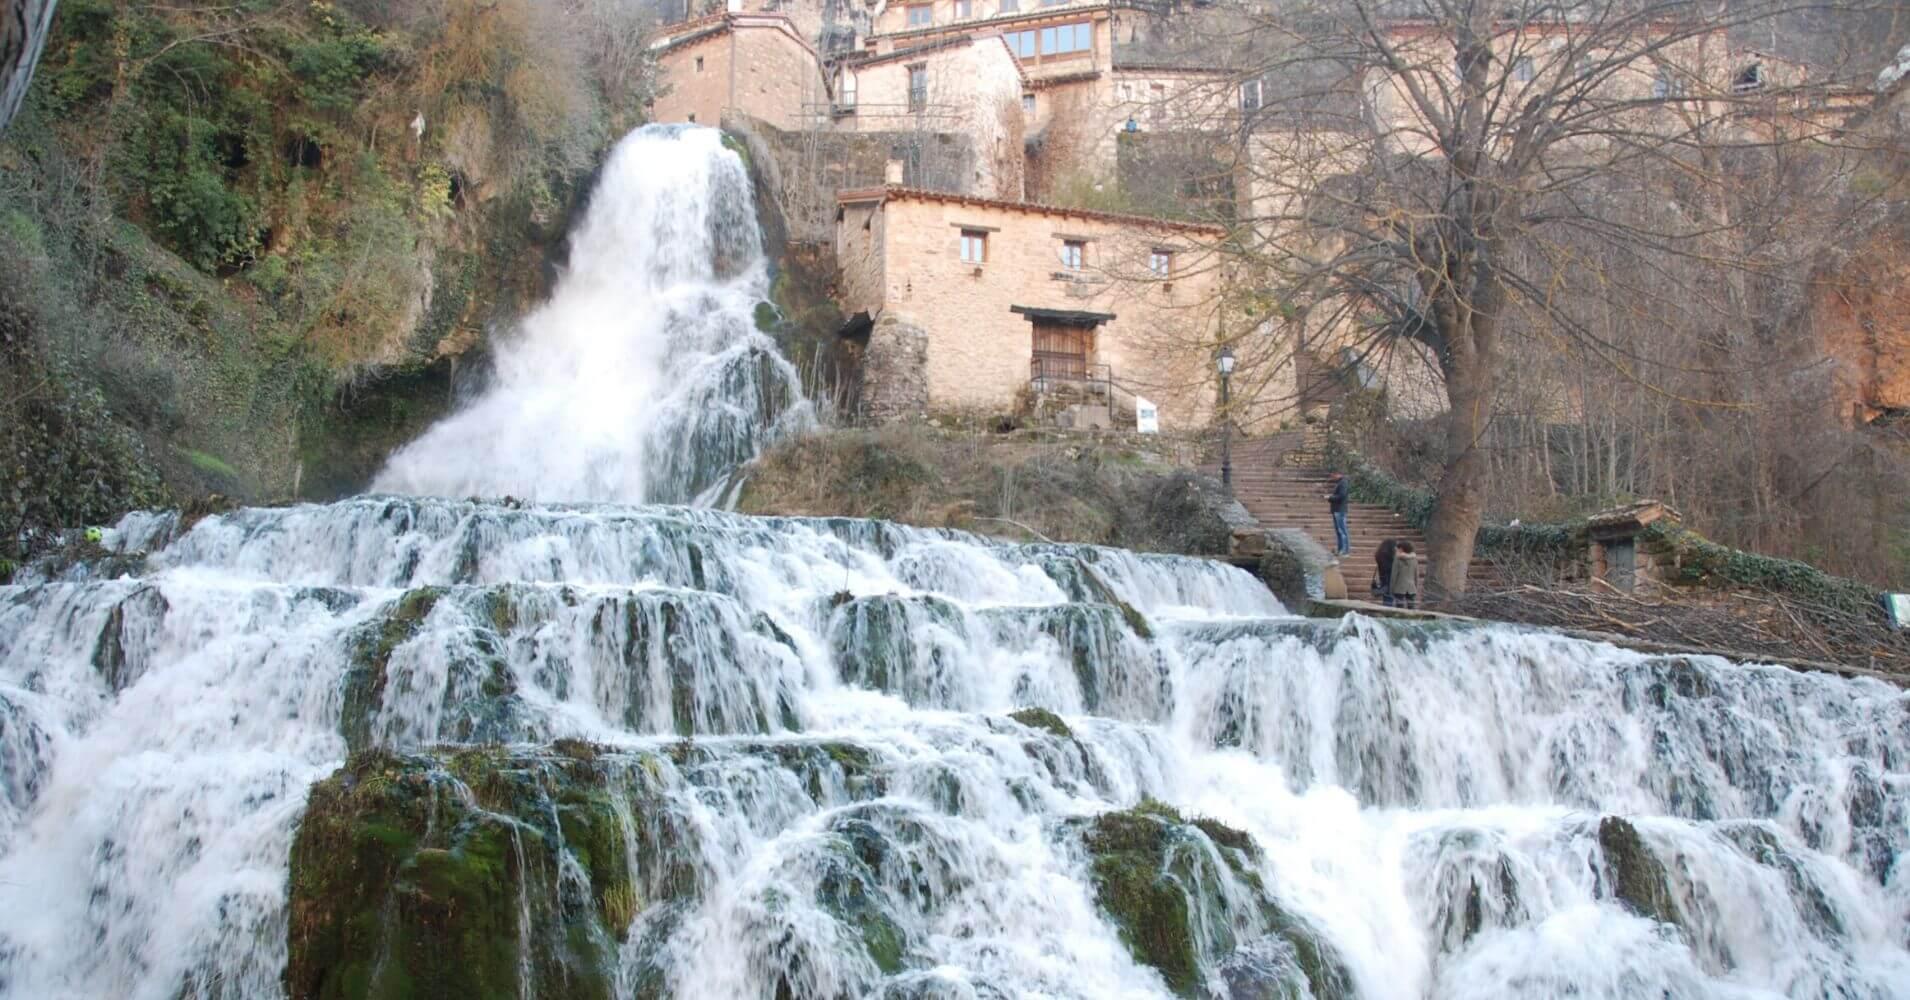 Orbaneja del Castillo. Viaje a Las Merindades. Burgos.